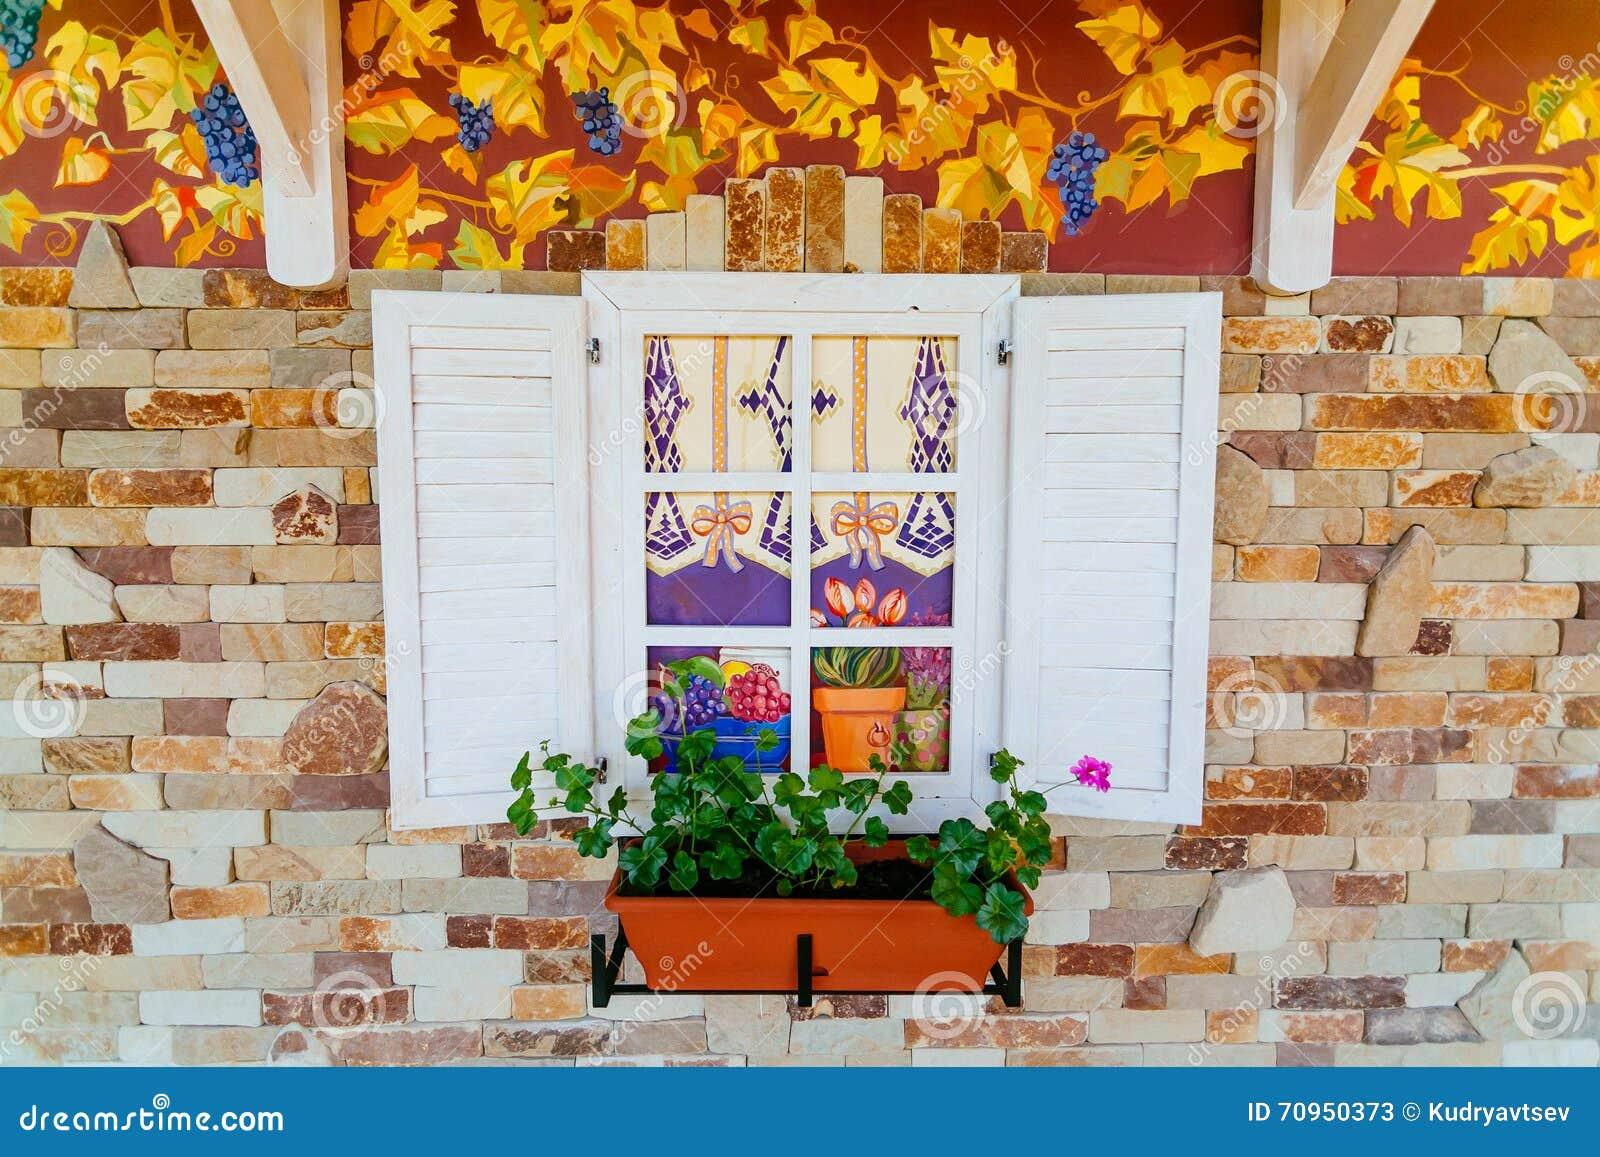 Artificial Window Artificial Window Stock Photo Image 70950373